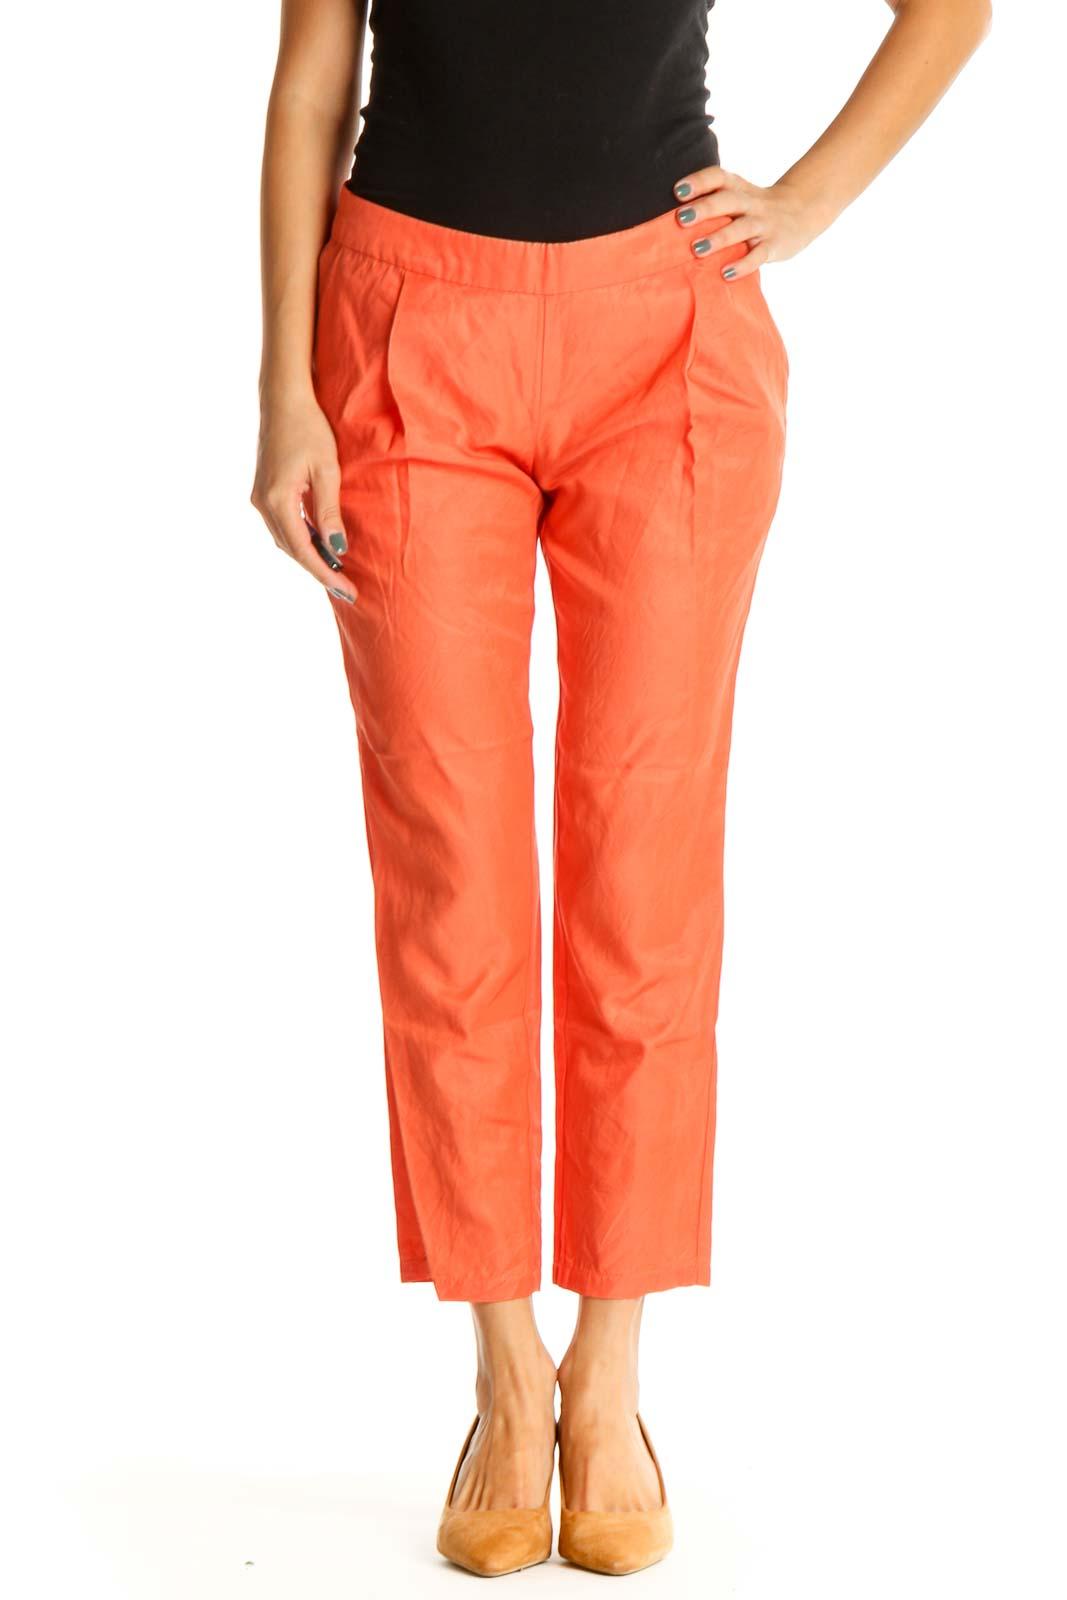 Orange Solid Casual Capri Pants Front